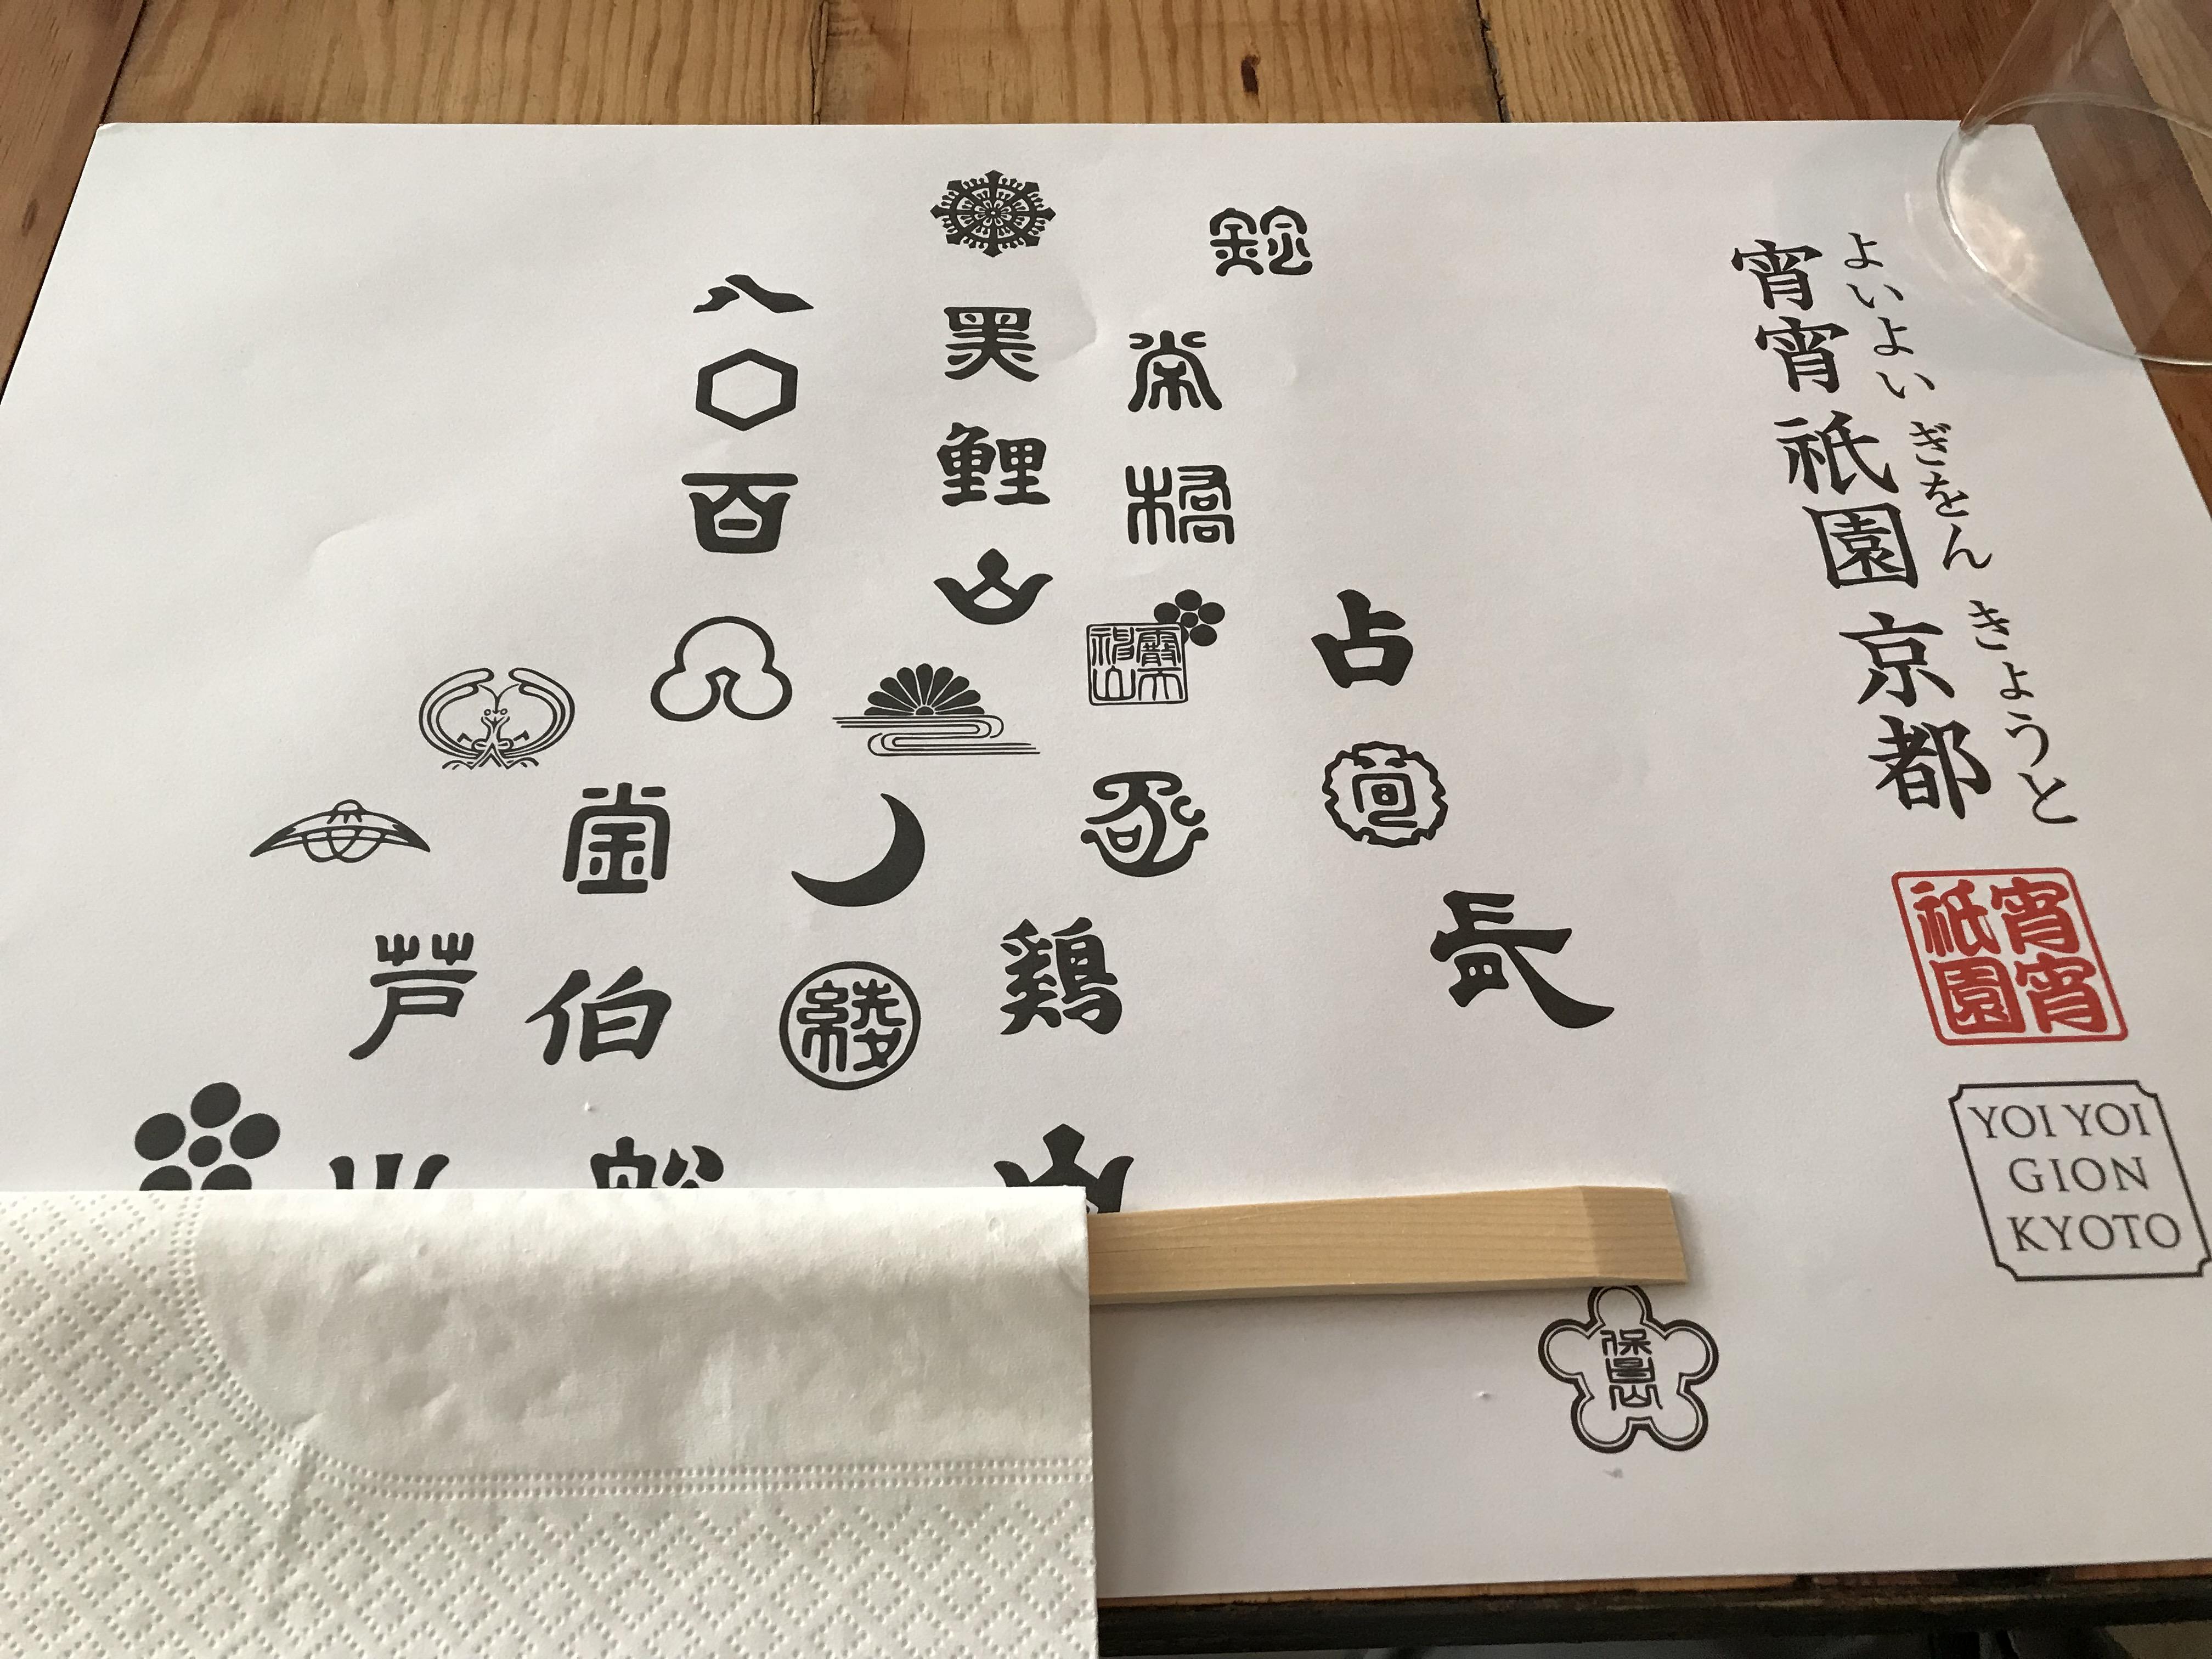 Yoi Yoi Gion 宵宵祇園